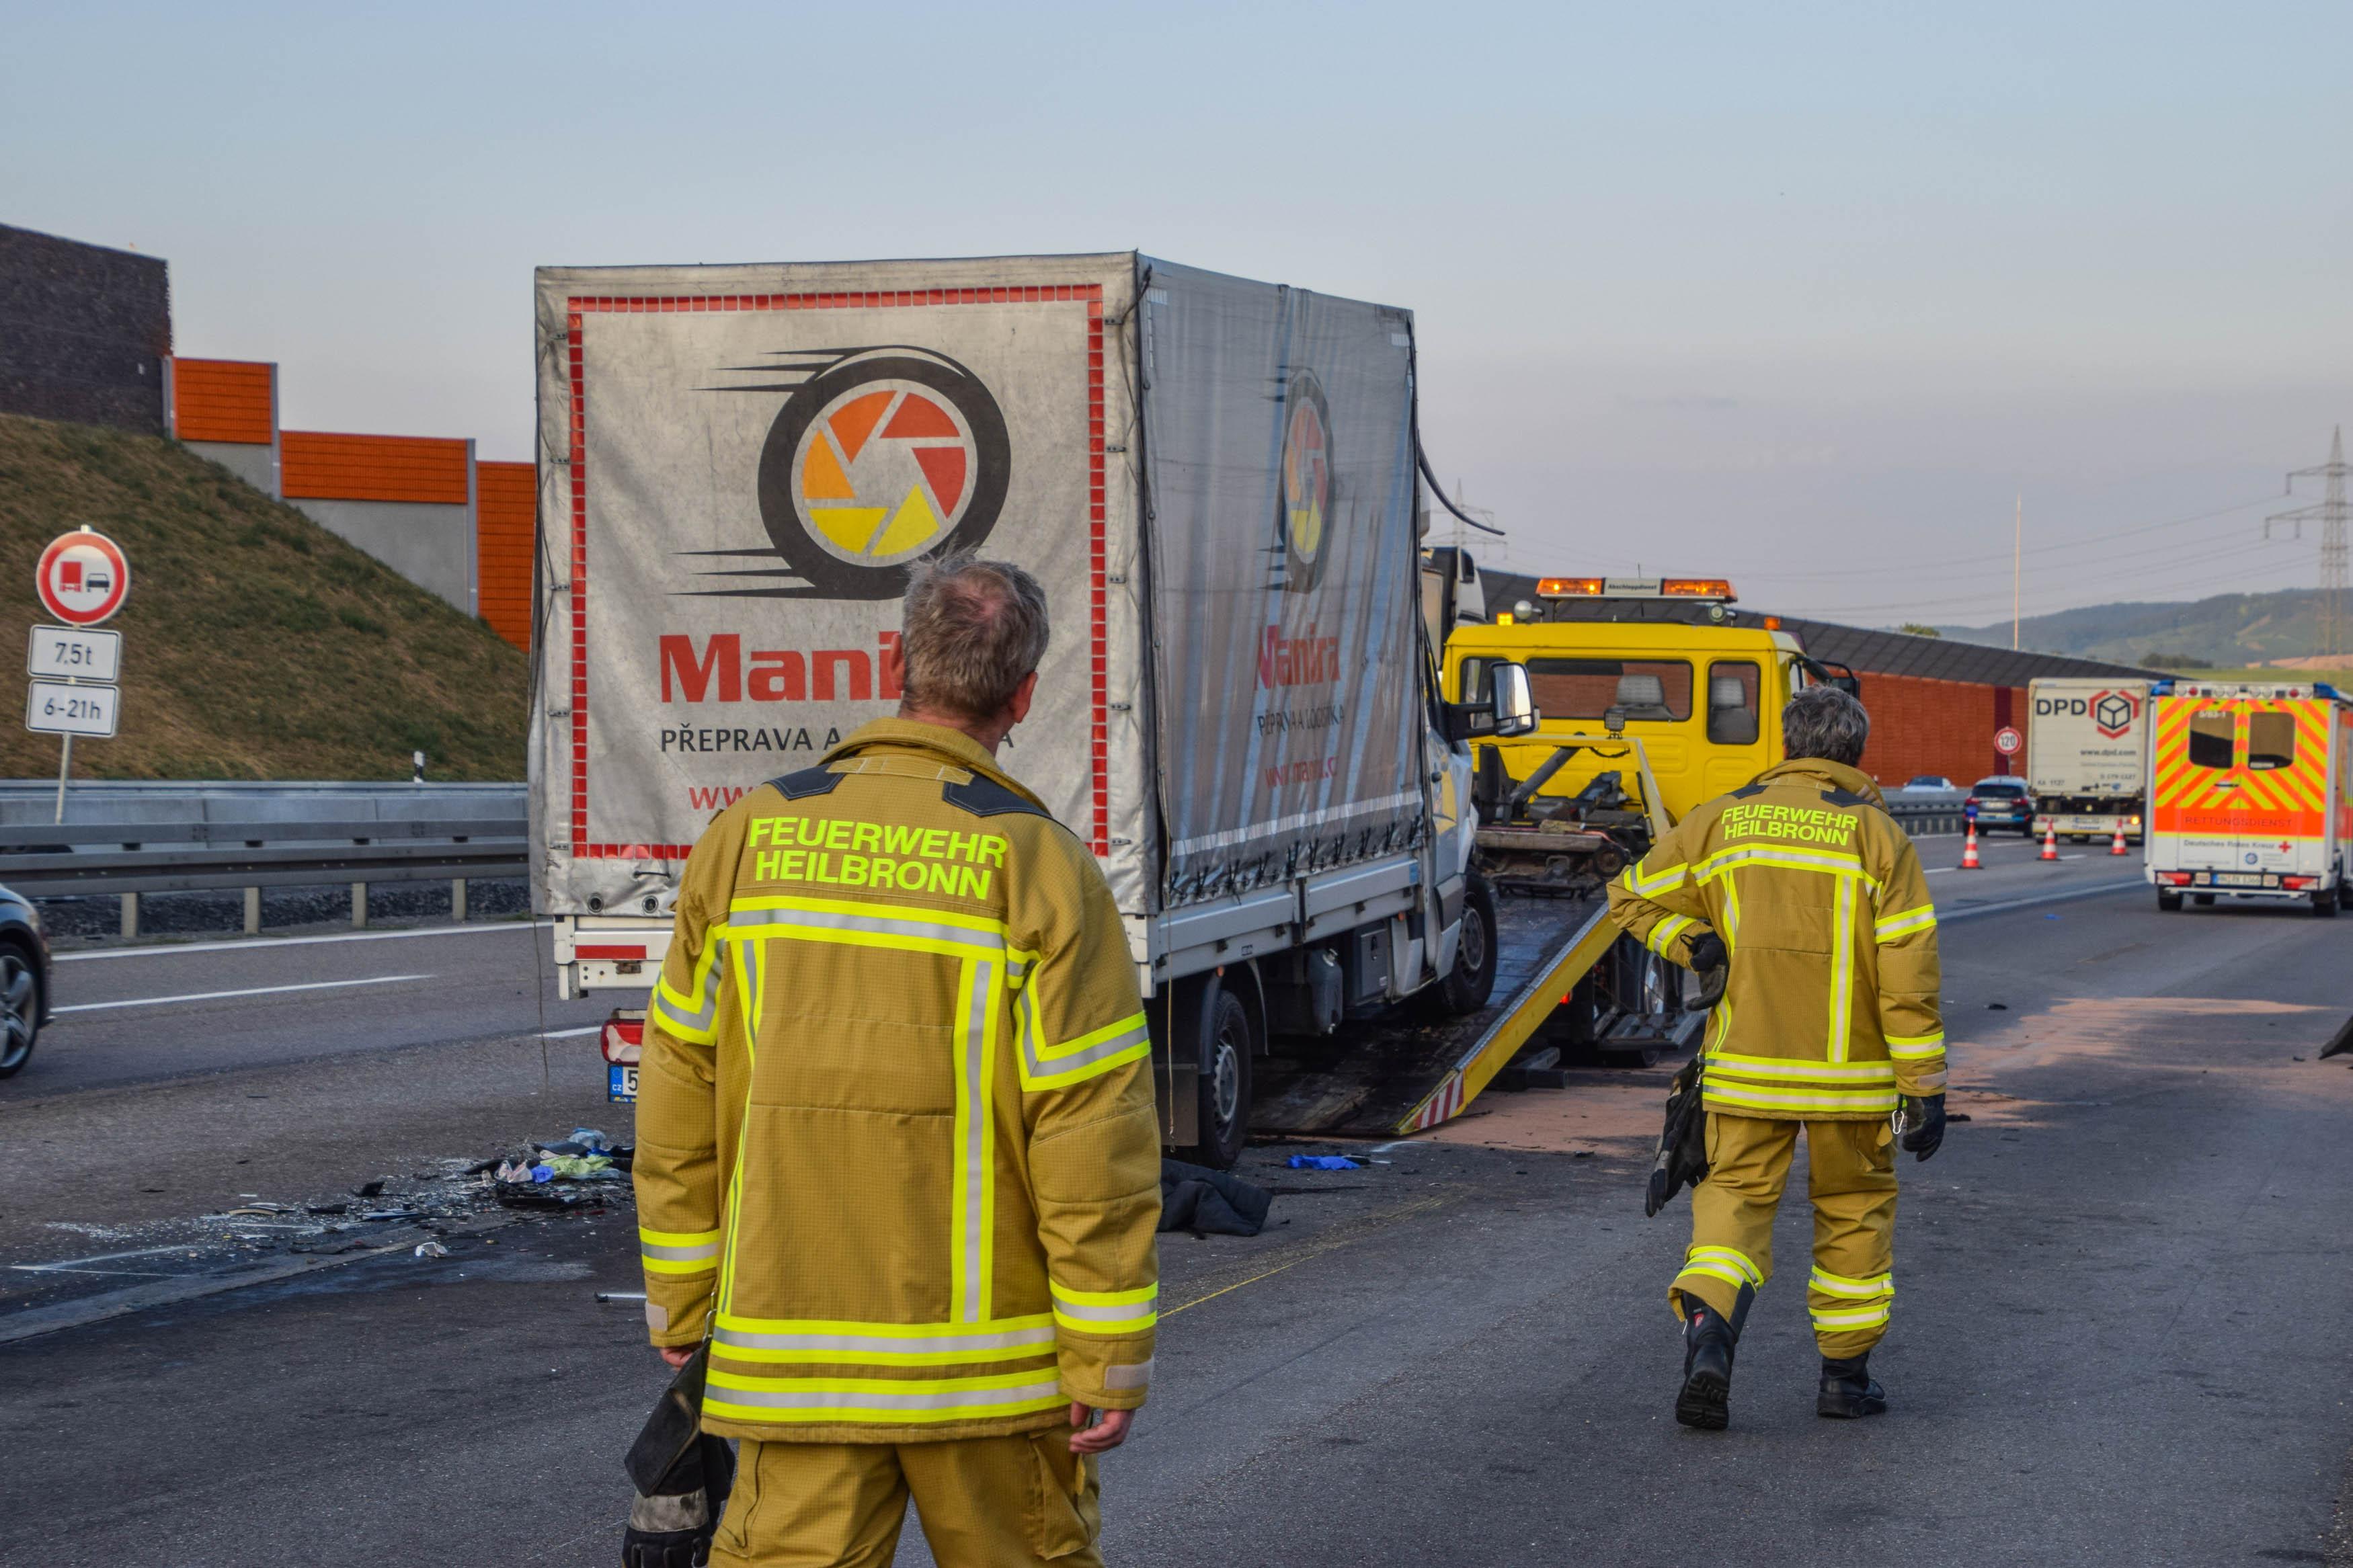 A6 Tödlicher Unfall Bei Heilbronn Radio Regenbogen